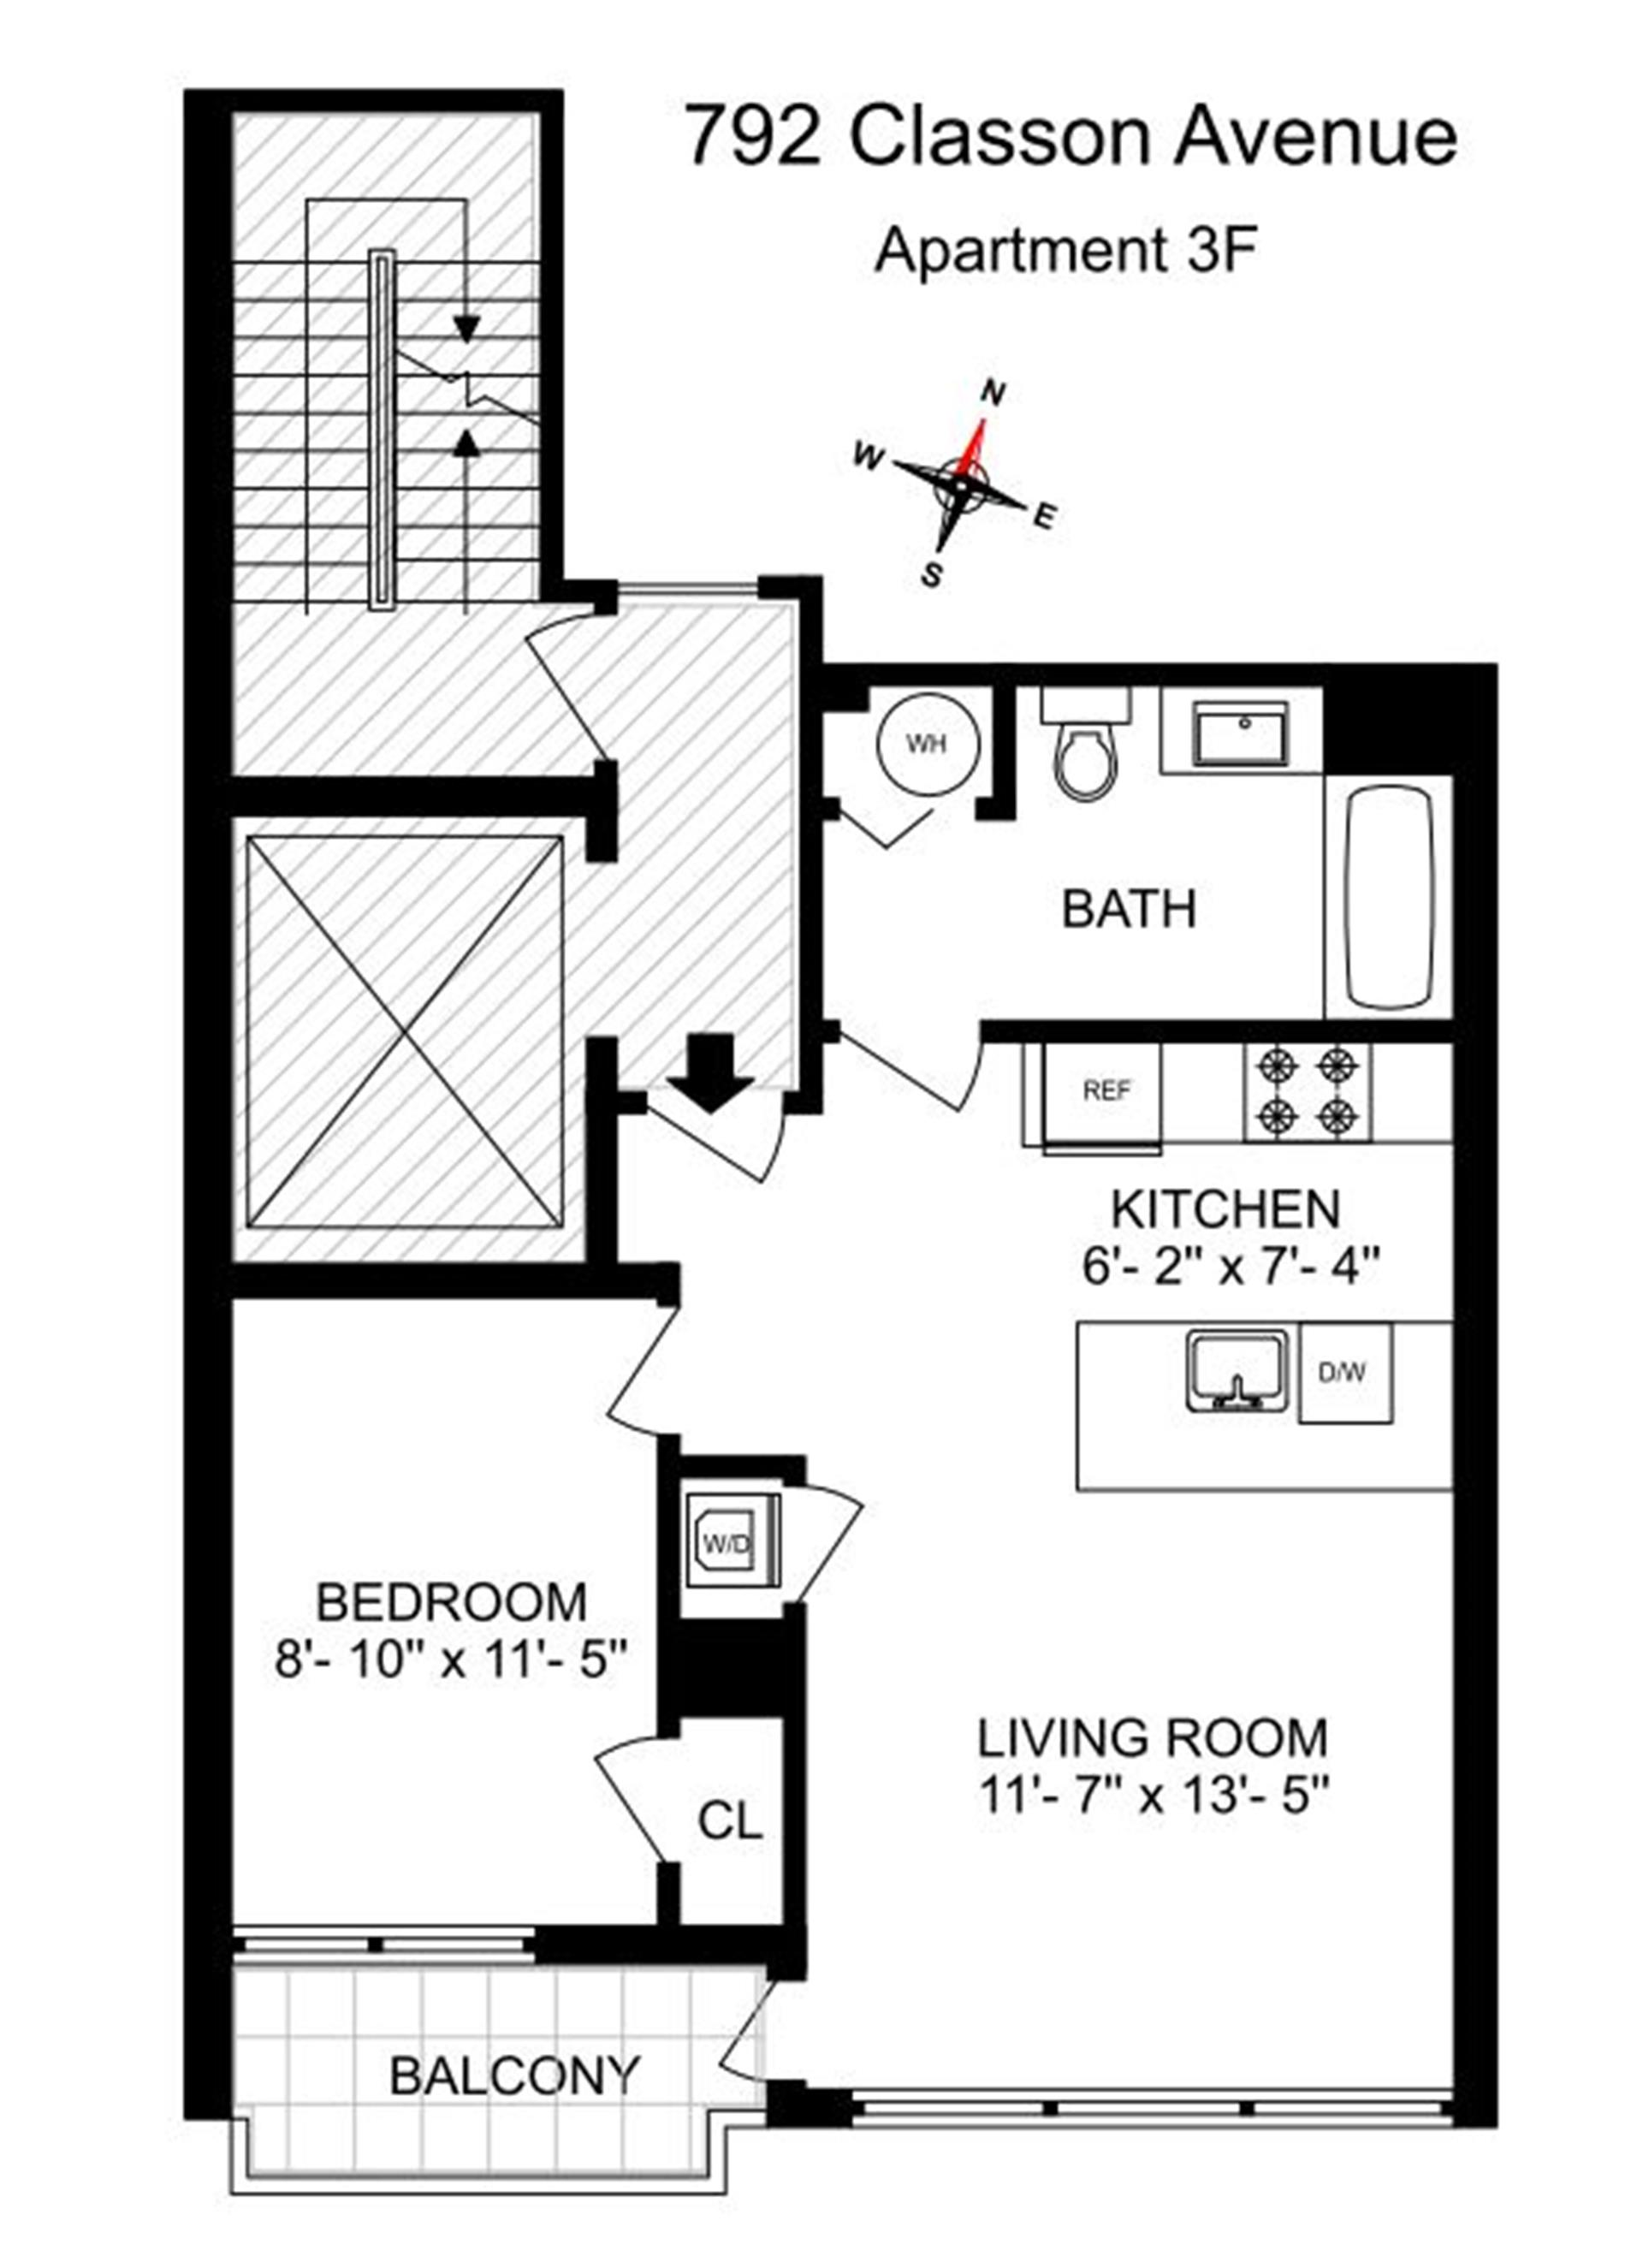 Floor plan of 792 Classon Avenue, 3F - Prospect Heights, New York